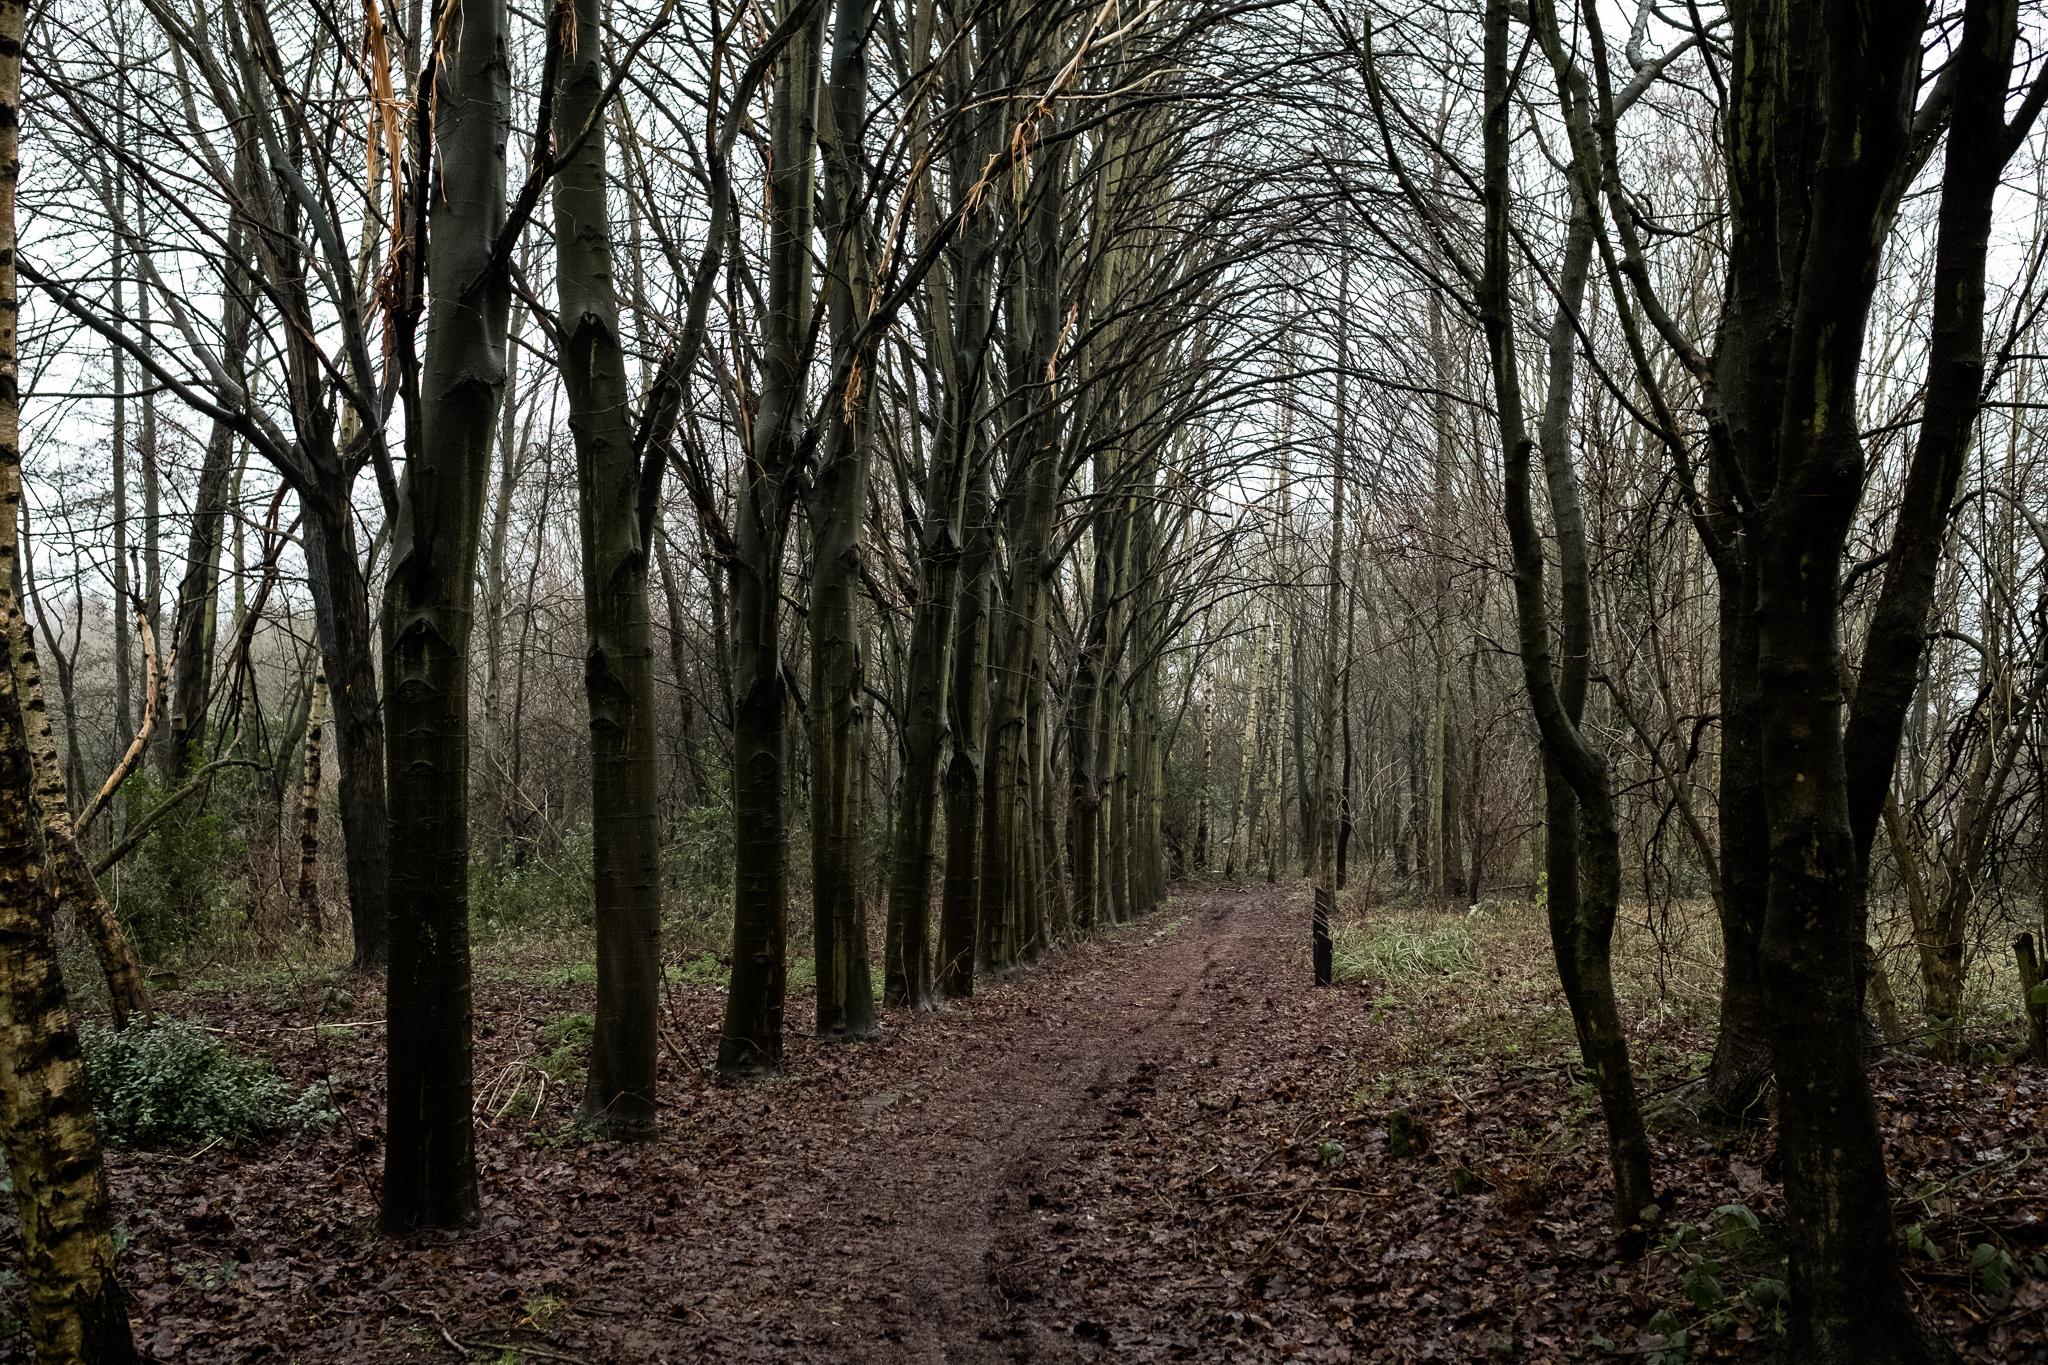 Closer to Home Walk Photowalk Joiner's Square, Hanley, Stoke-on-Trent, Staffordshire Winter Nature Reserve-22.jpg